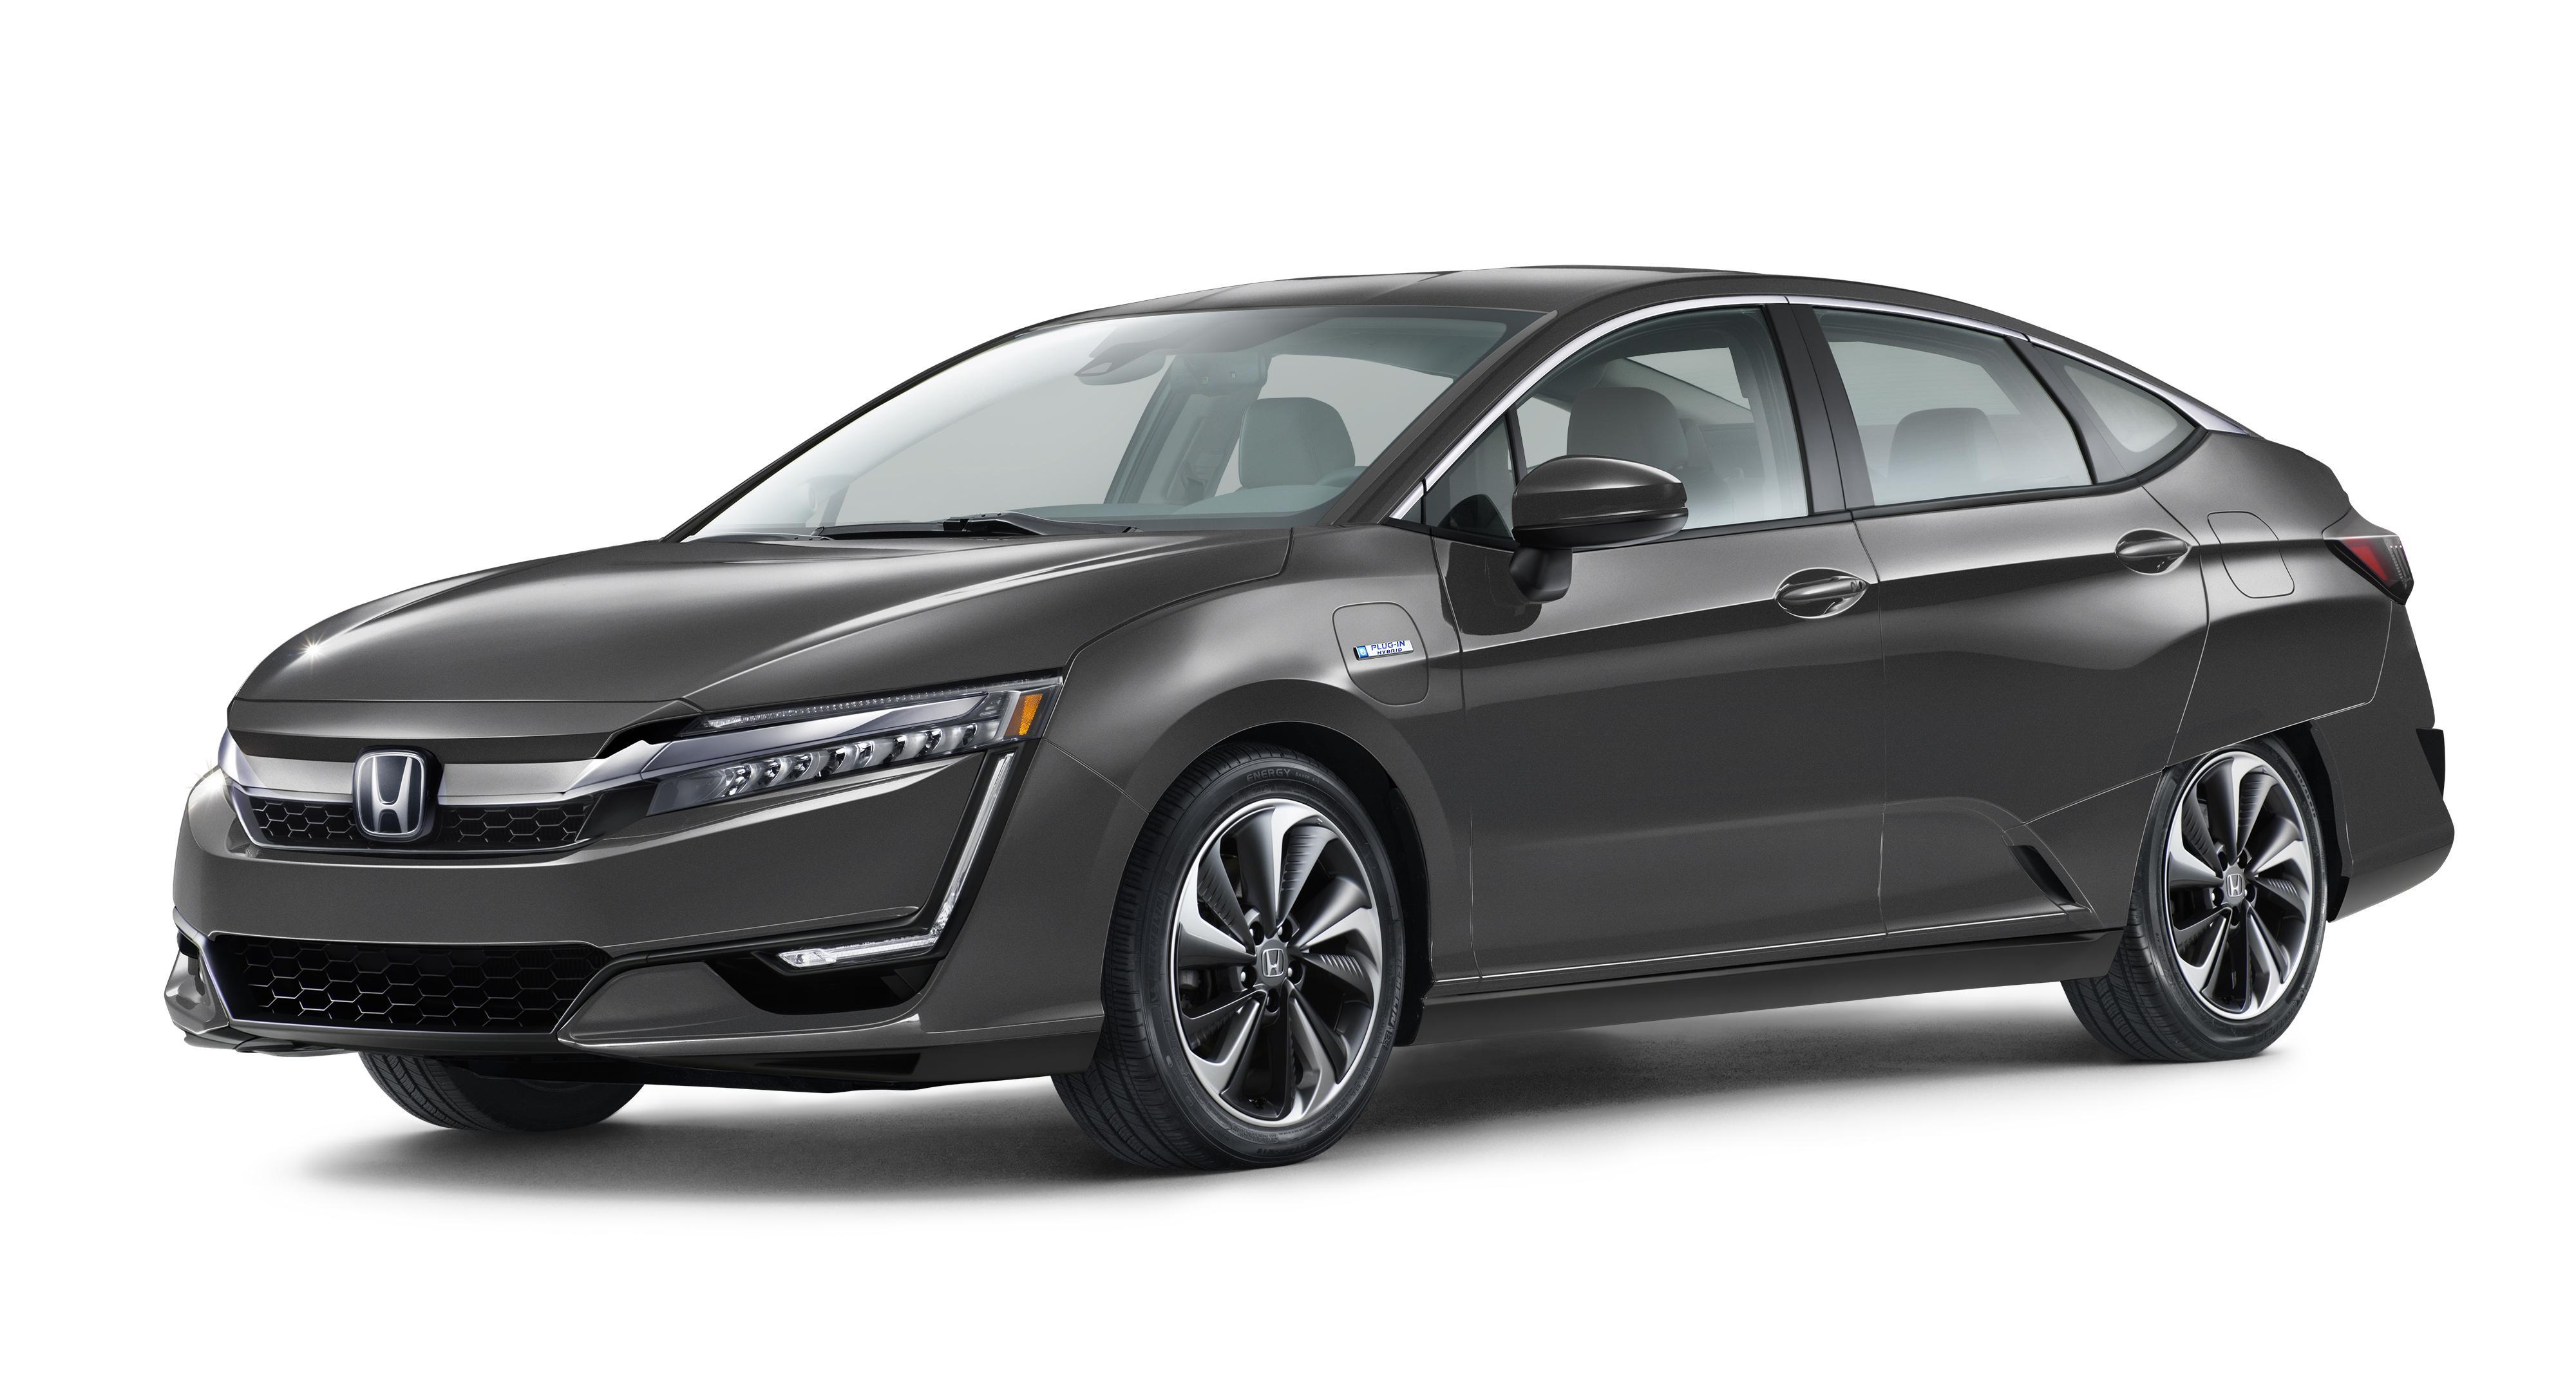 2018 Honda Clarity Electric